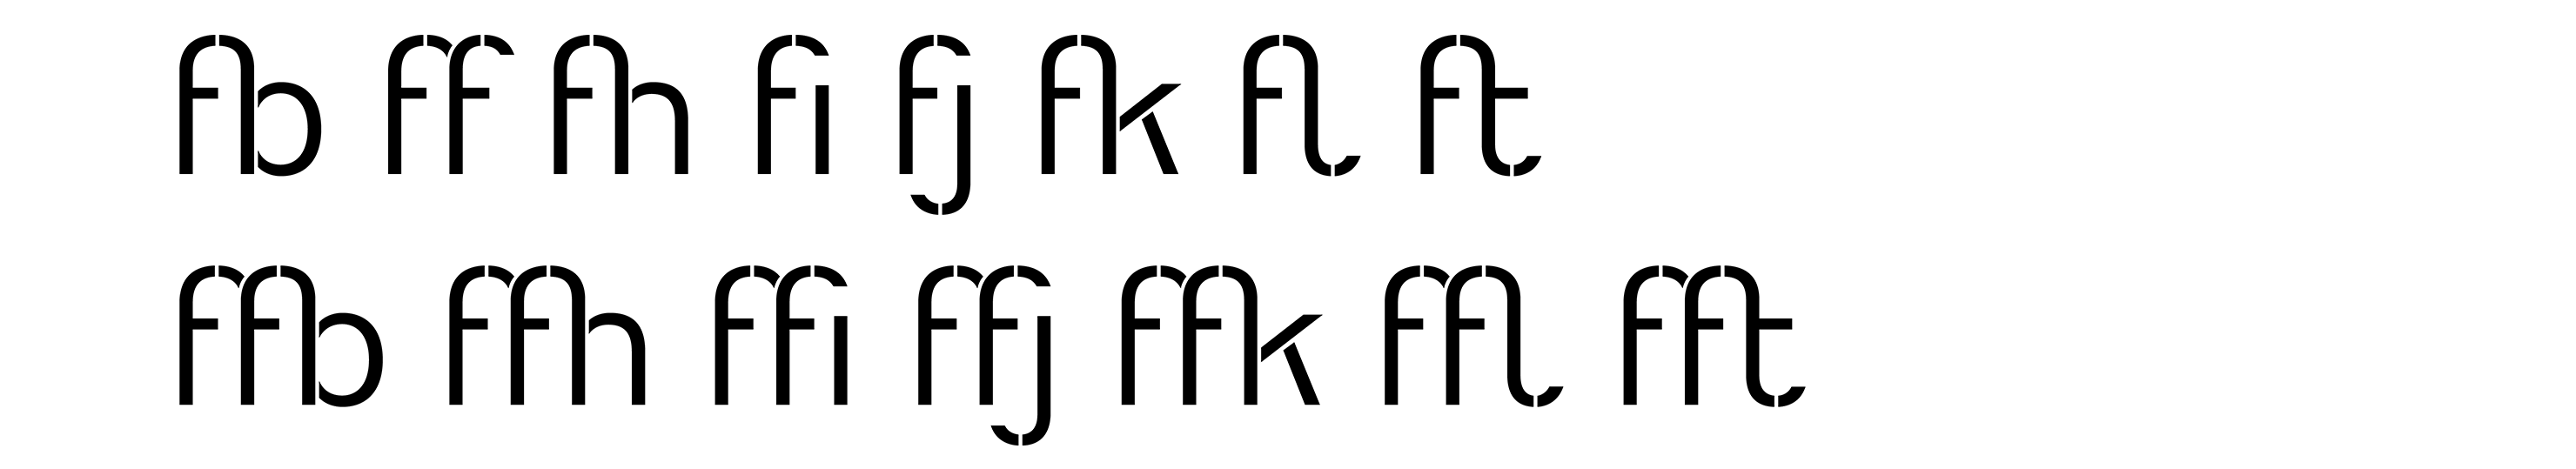 Typeface-Heimat-Stencil-F03-Atlas-Font-Foundry